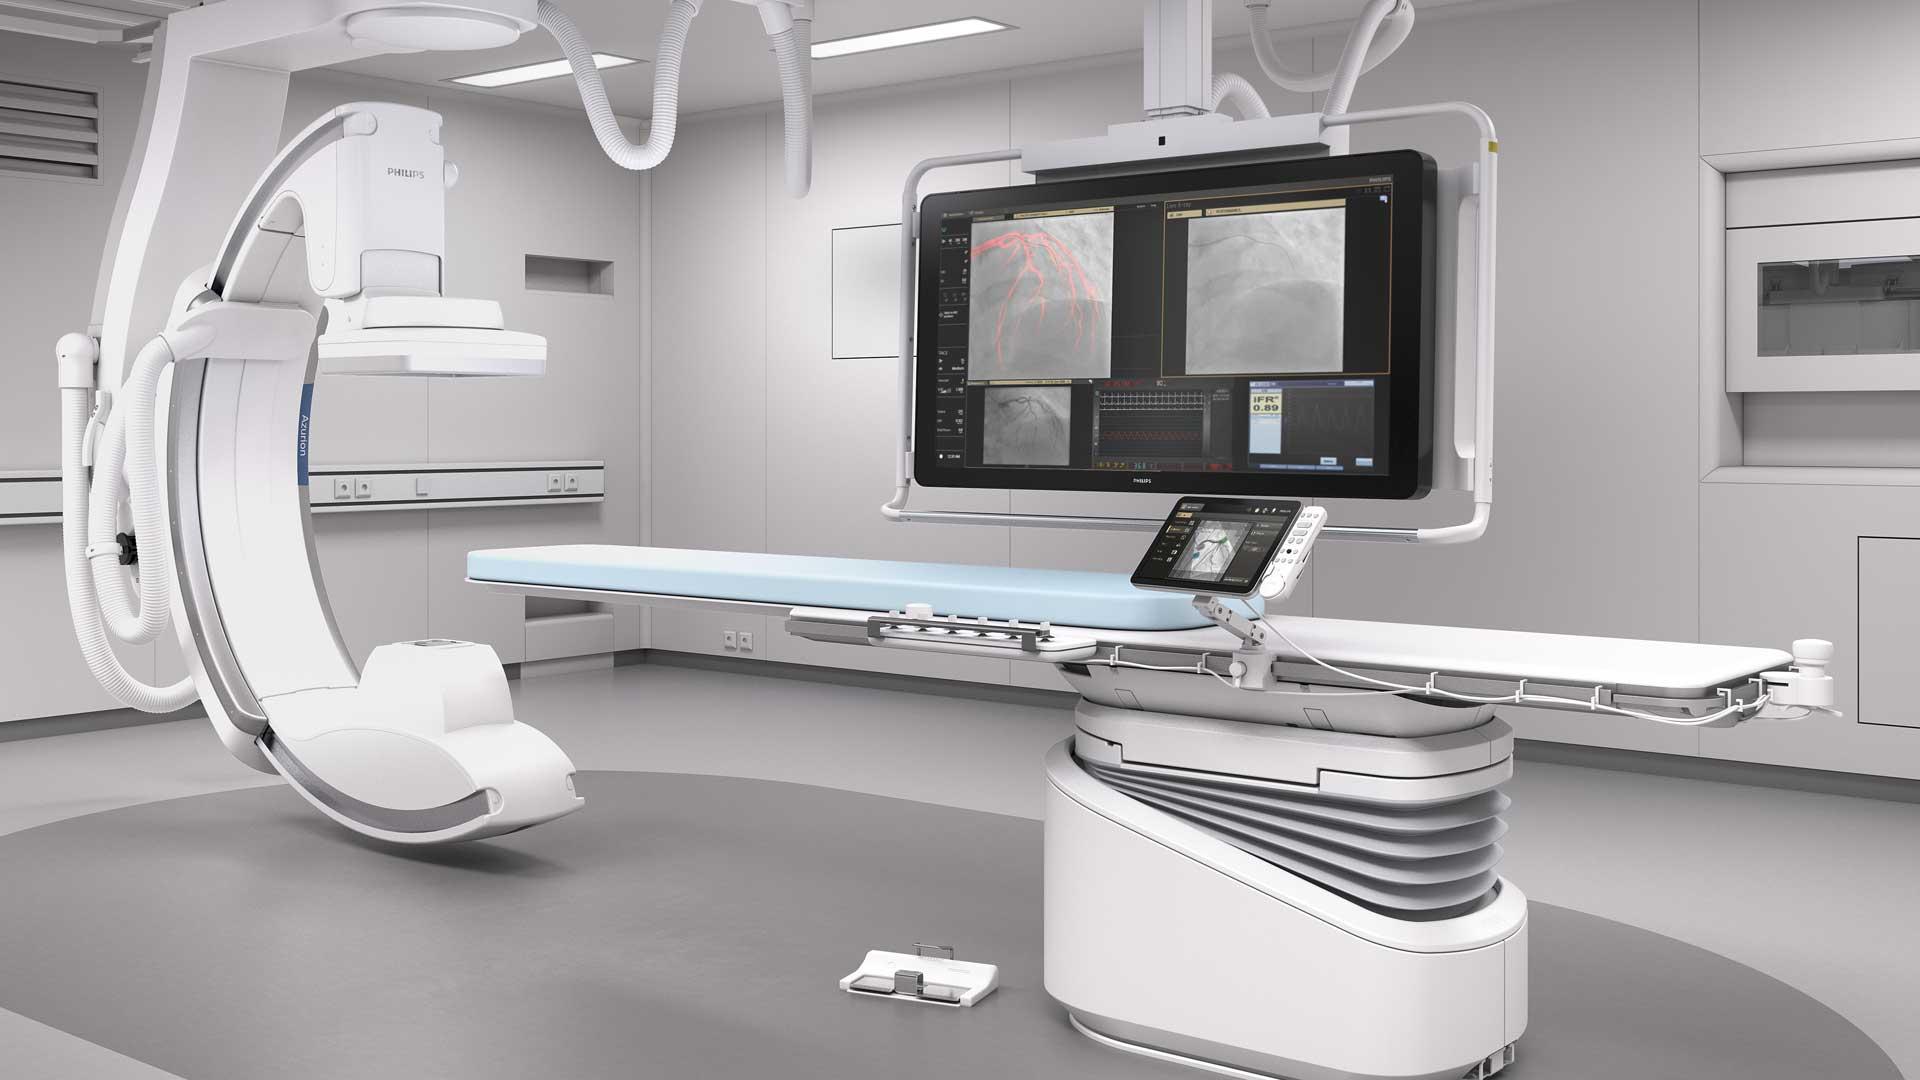 Kardiocentrum Frankfurt Herzkatheterlabor Azurion 7 C20 OR Flexvision